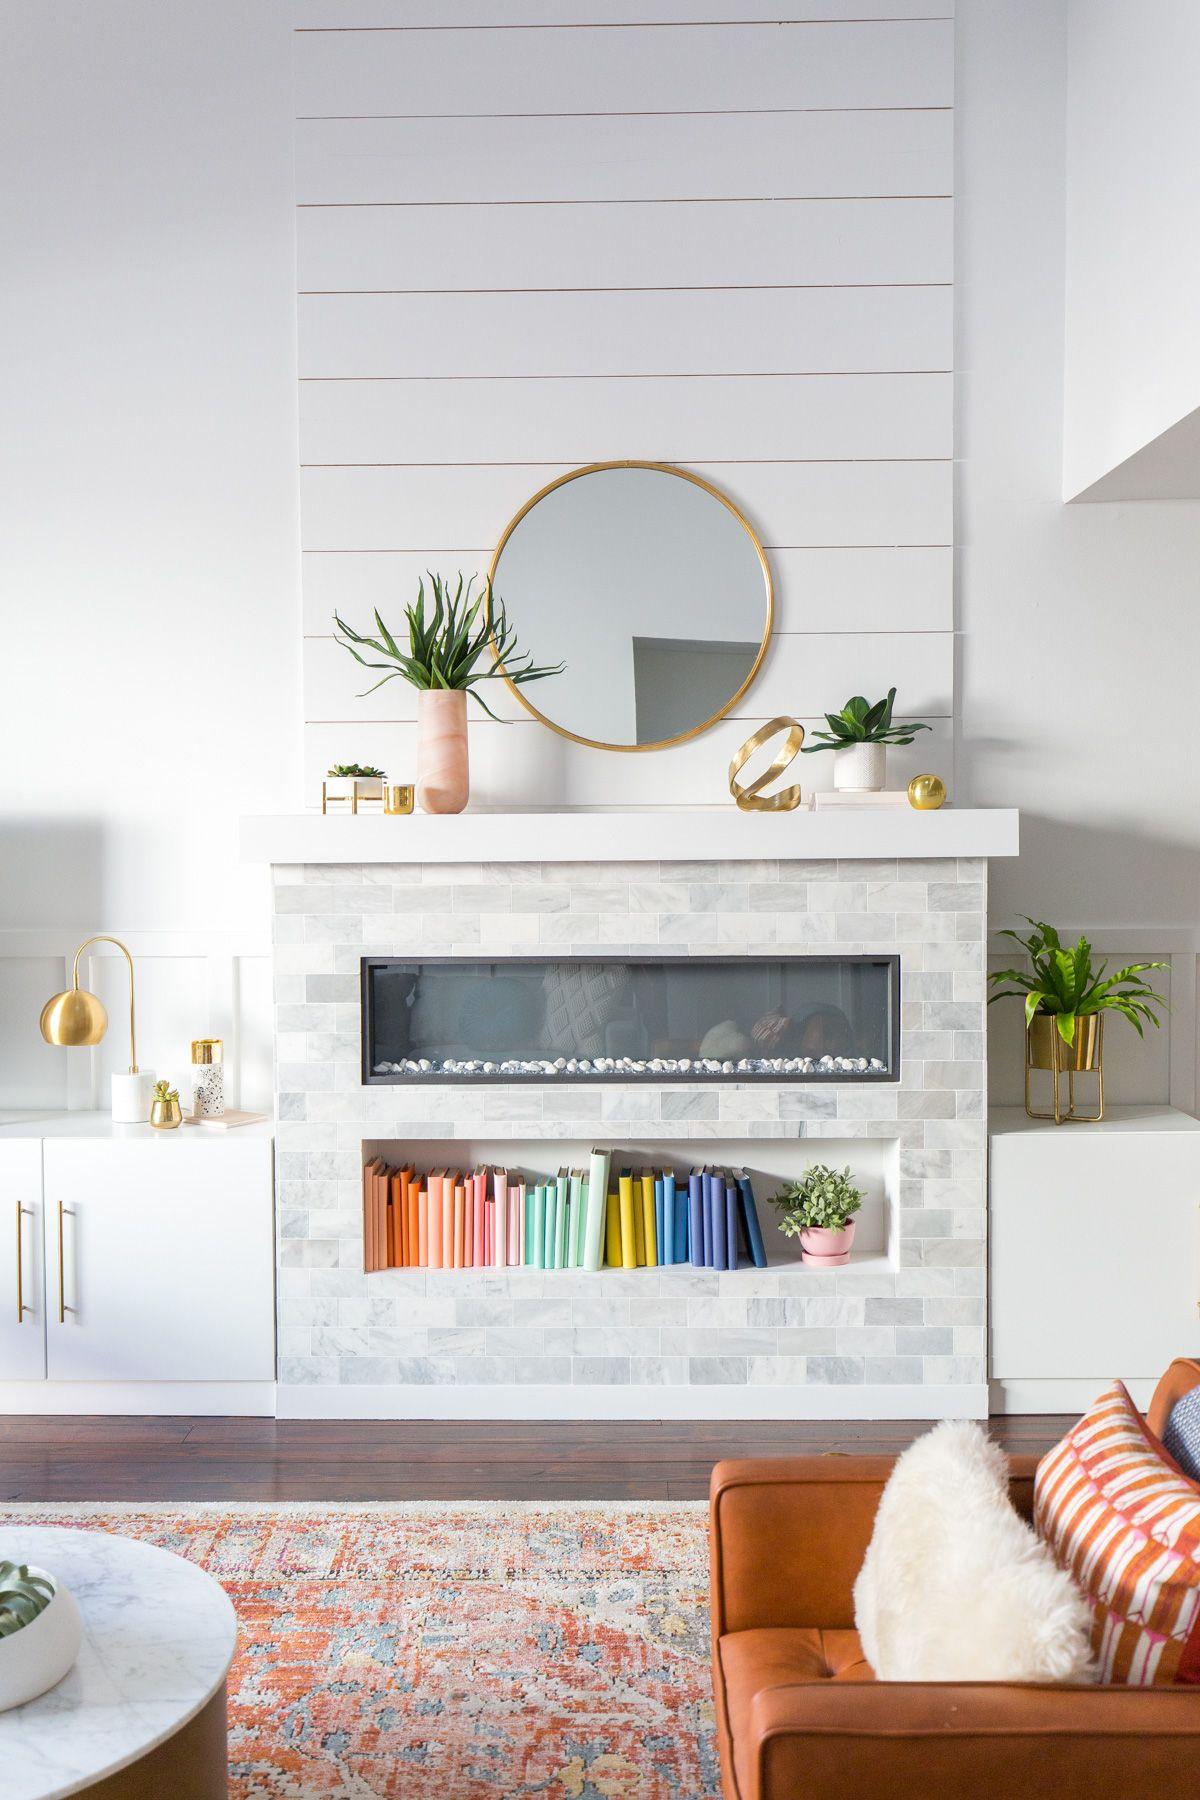 10 Unique Fireplace Mantel Decor Ideas How To Decorate Your Mantel